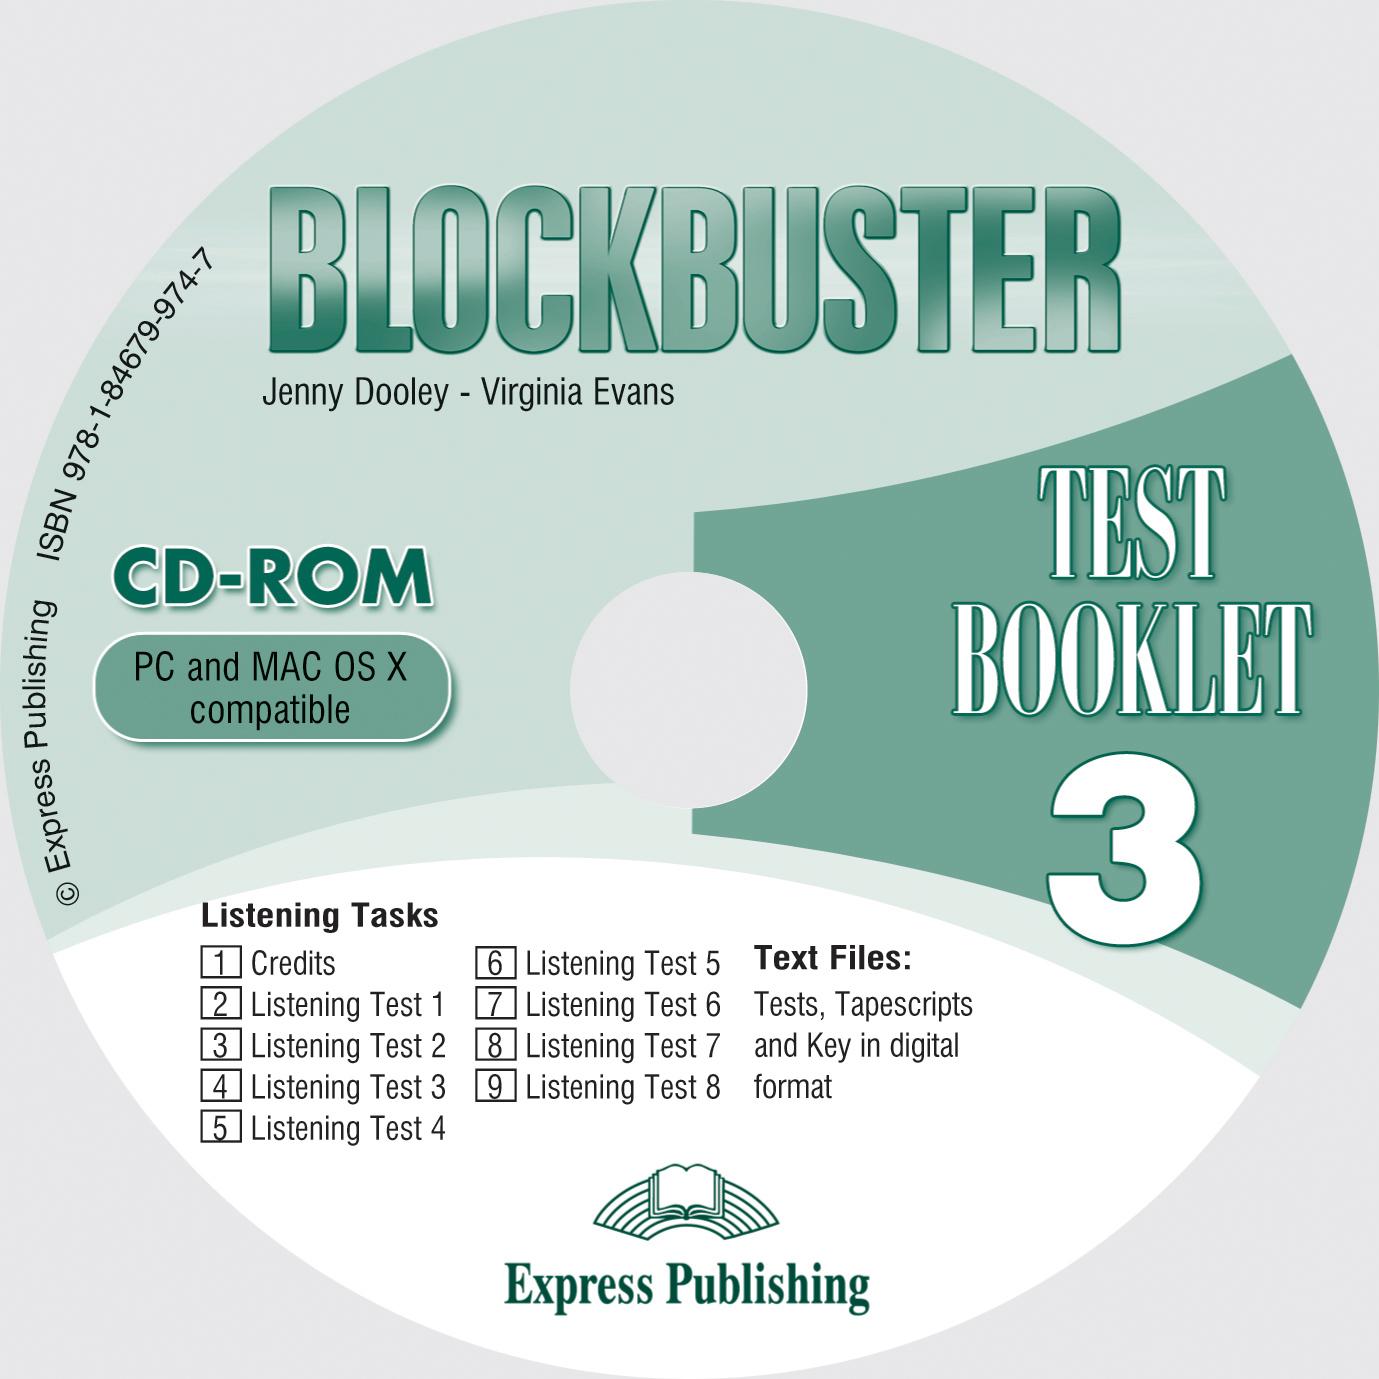 BLOCKBUSTER 3 CD-ROM TEST (1)